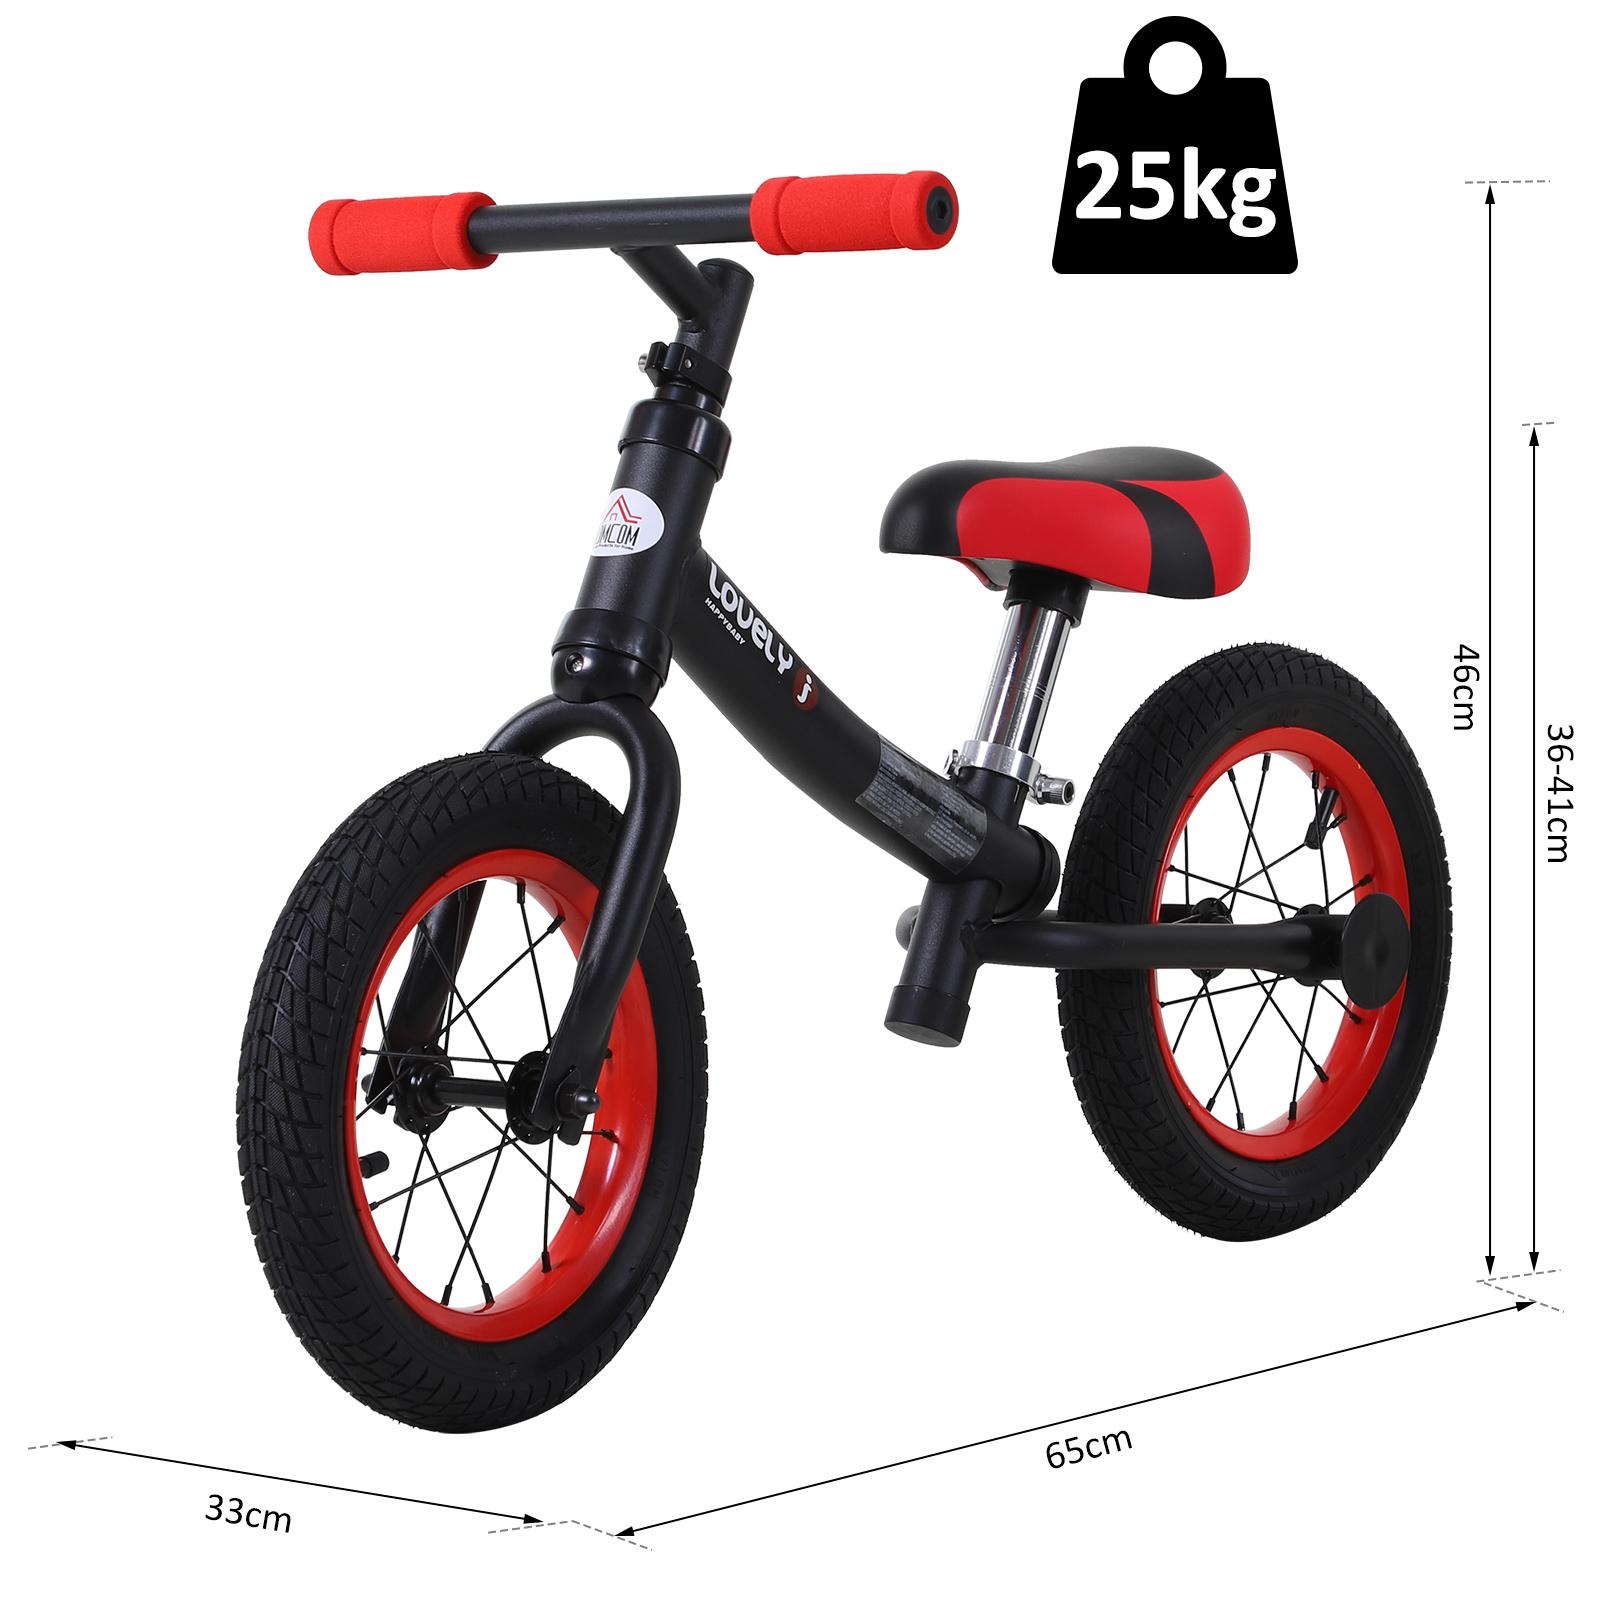 Bicicleta-sin-Pedales-de-Altura-de-Asiento-Regulable-31-45cm-2-5-Anos miniatura 9